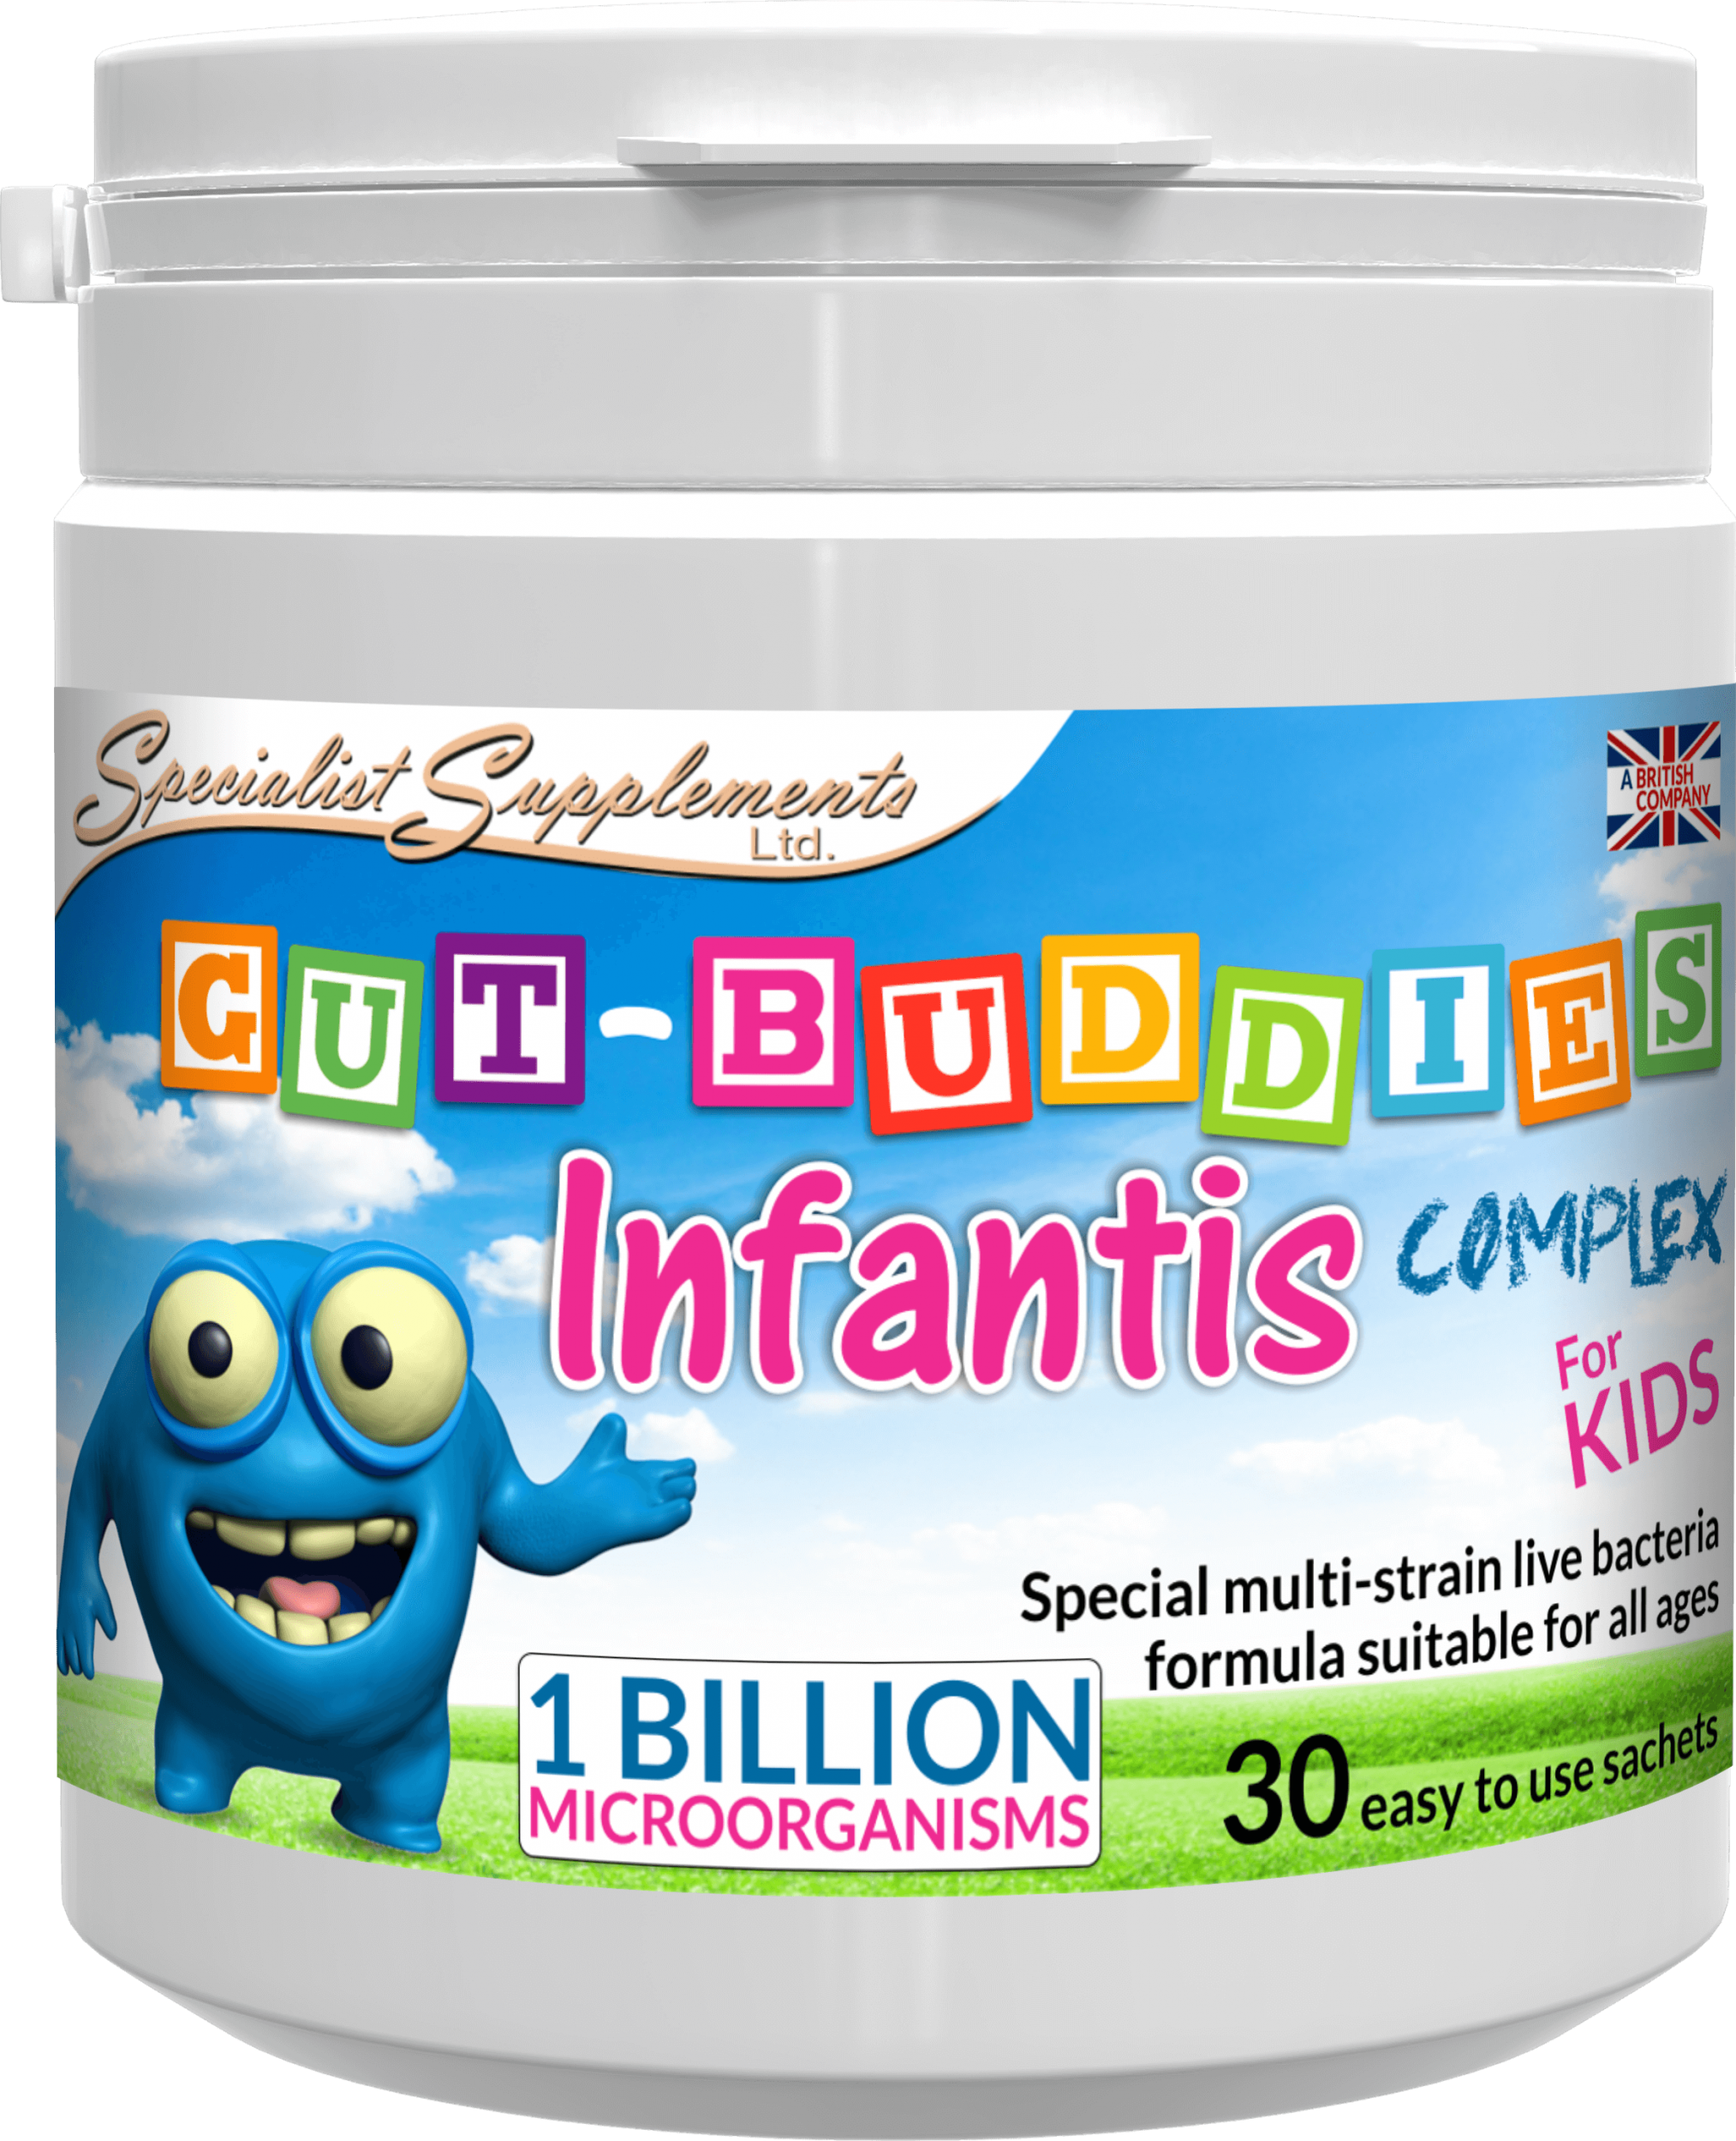 Gut-Buddies Infantis Complex 30's